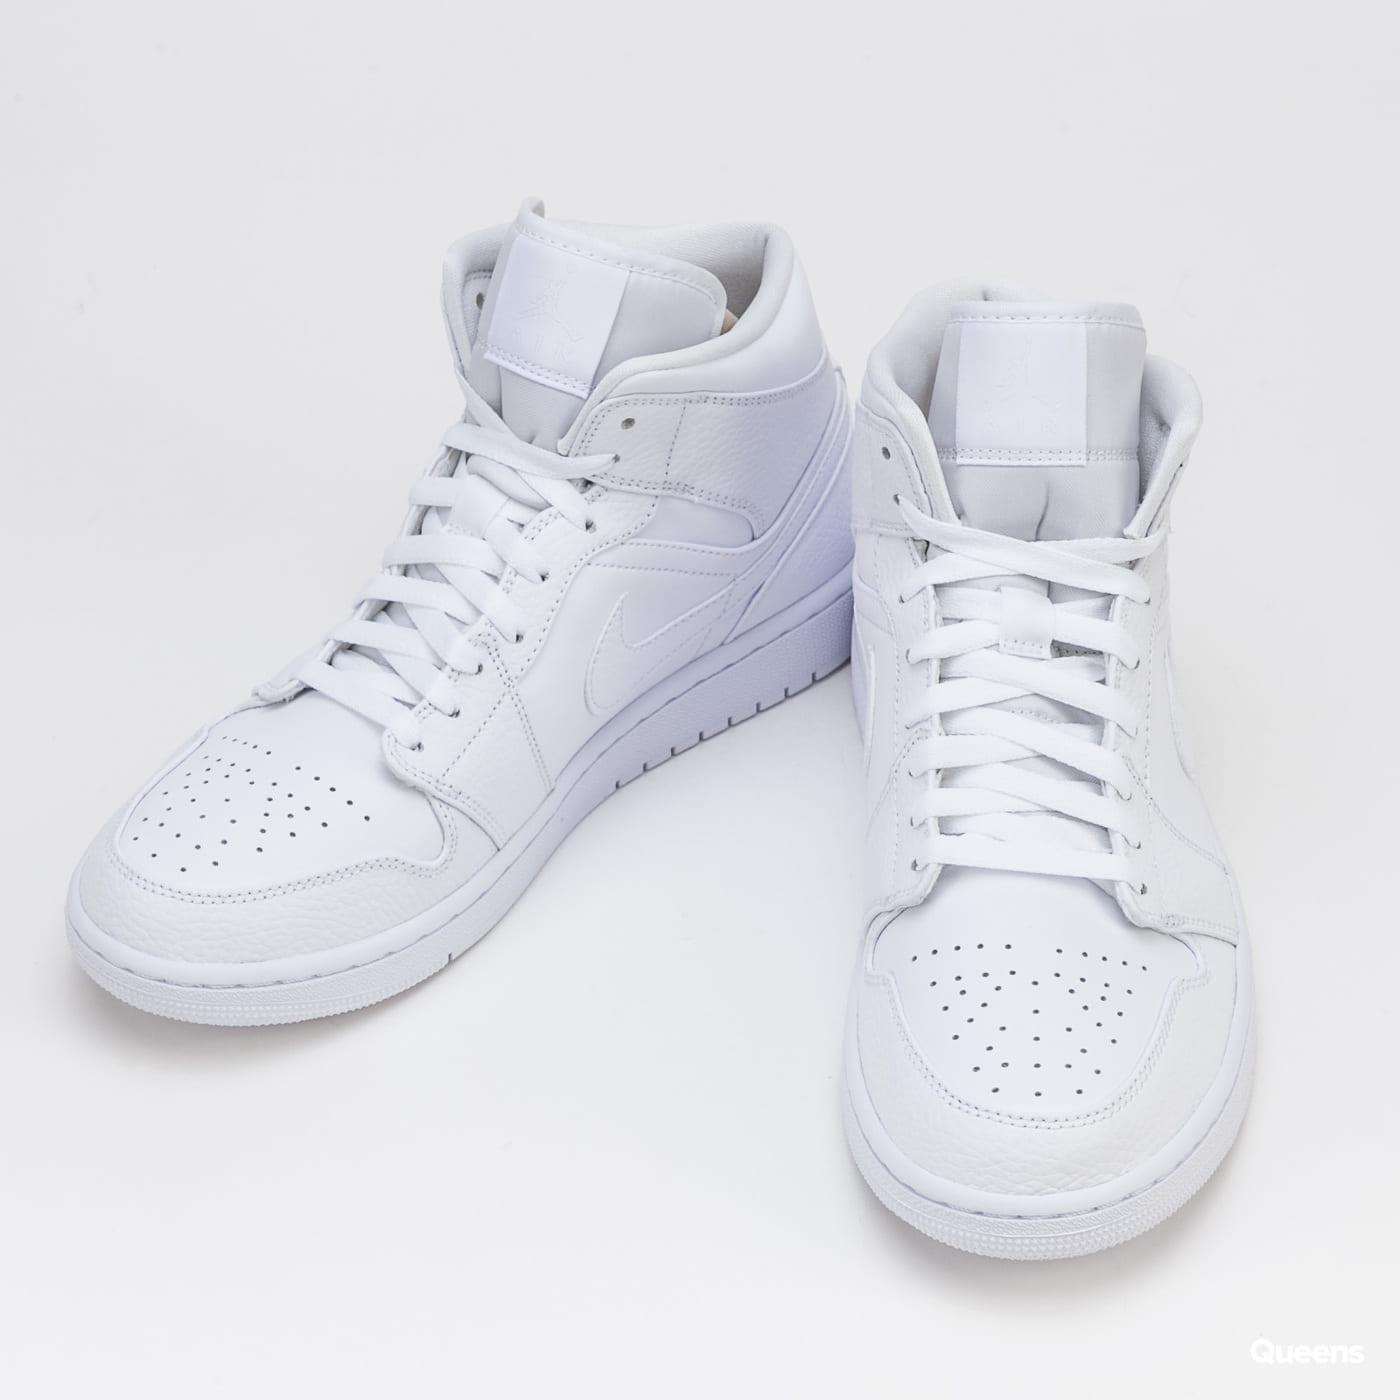 Jordan Air Jordan 1 Mid white / white - white